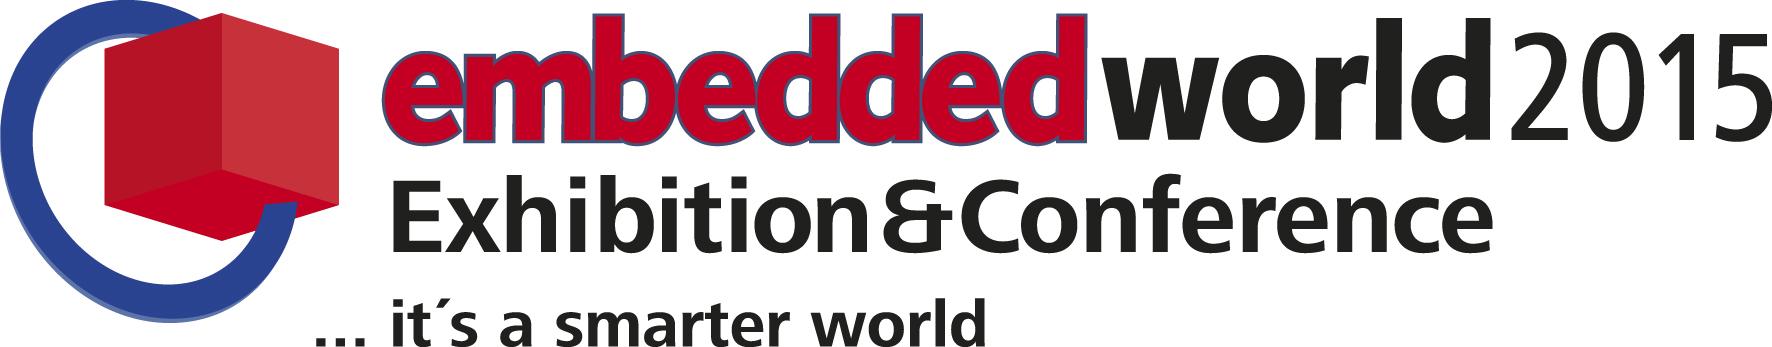 Embedded World Logo